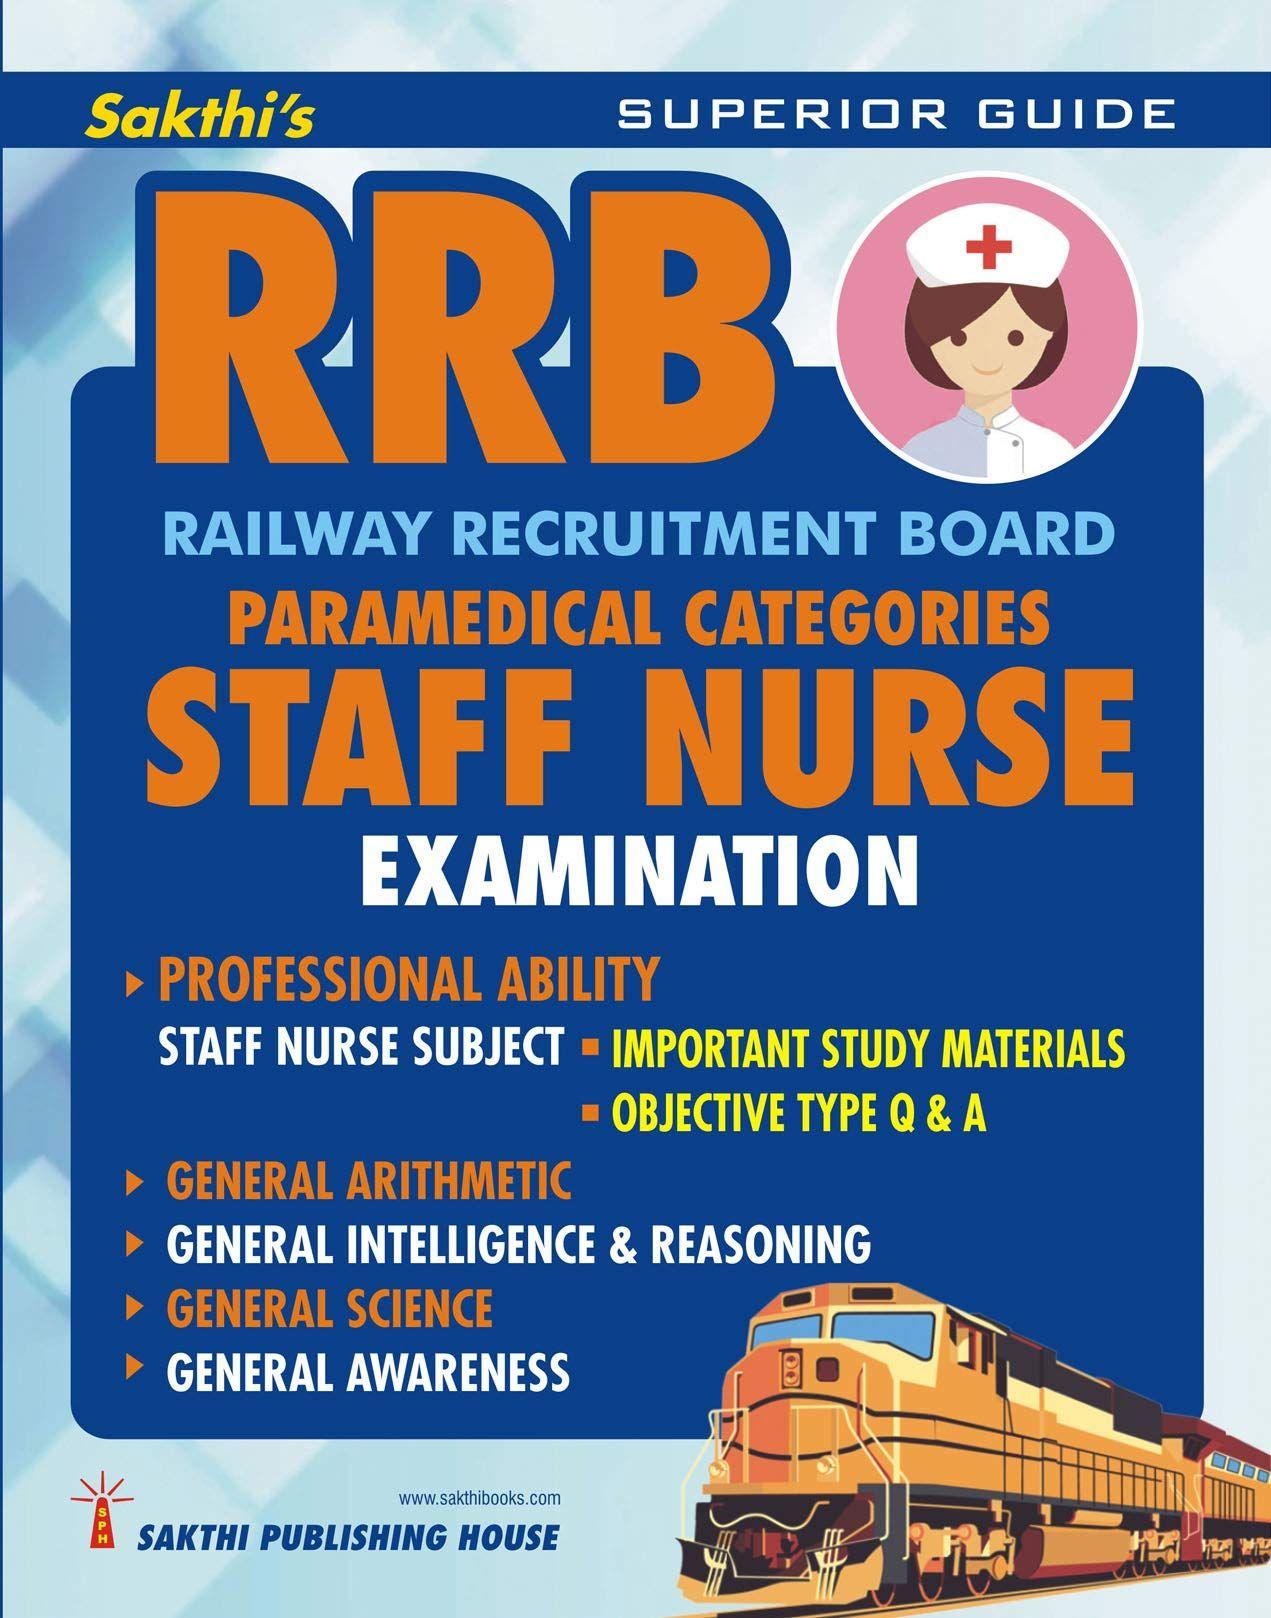 RRB Staff Nurse Examination Book 2019,Staff Nurse Exam Books Free